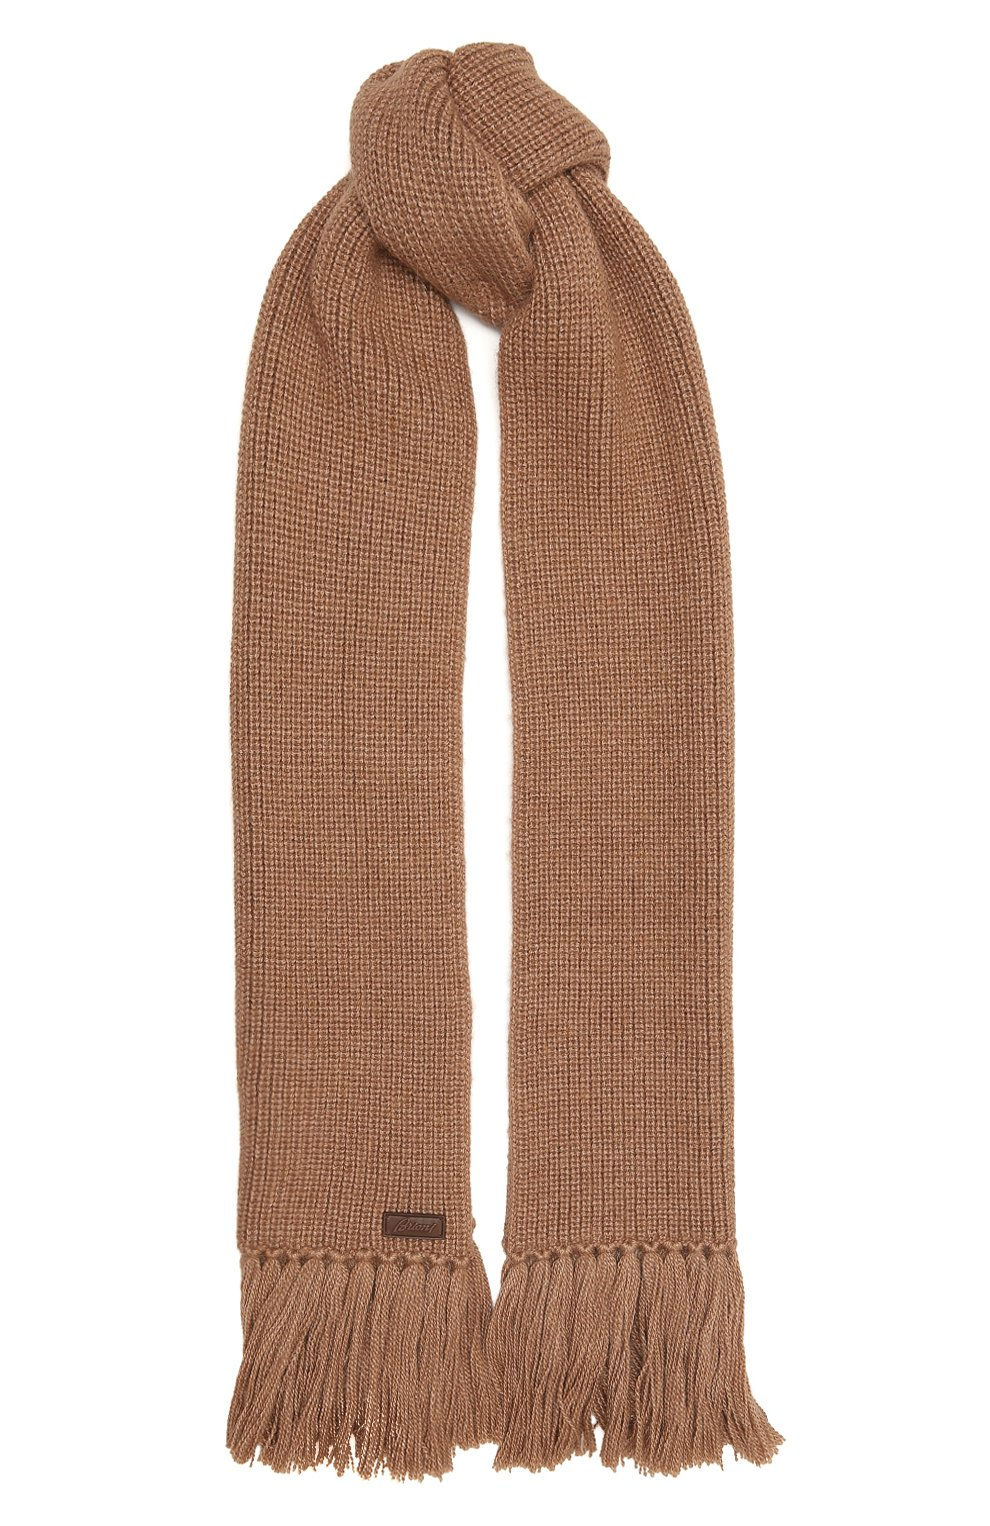 Мужской шарф из шерсти и шелка BRIONI бежевого цвета, арт. 03MF0L/09K32 | Фото 1